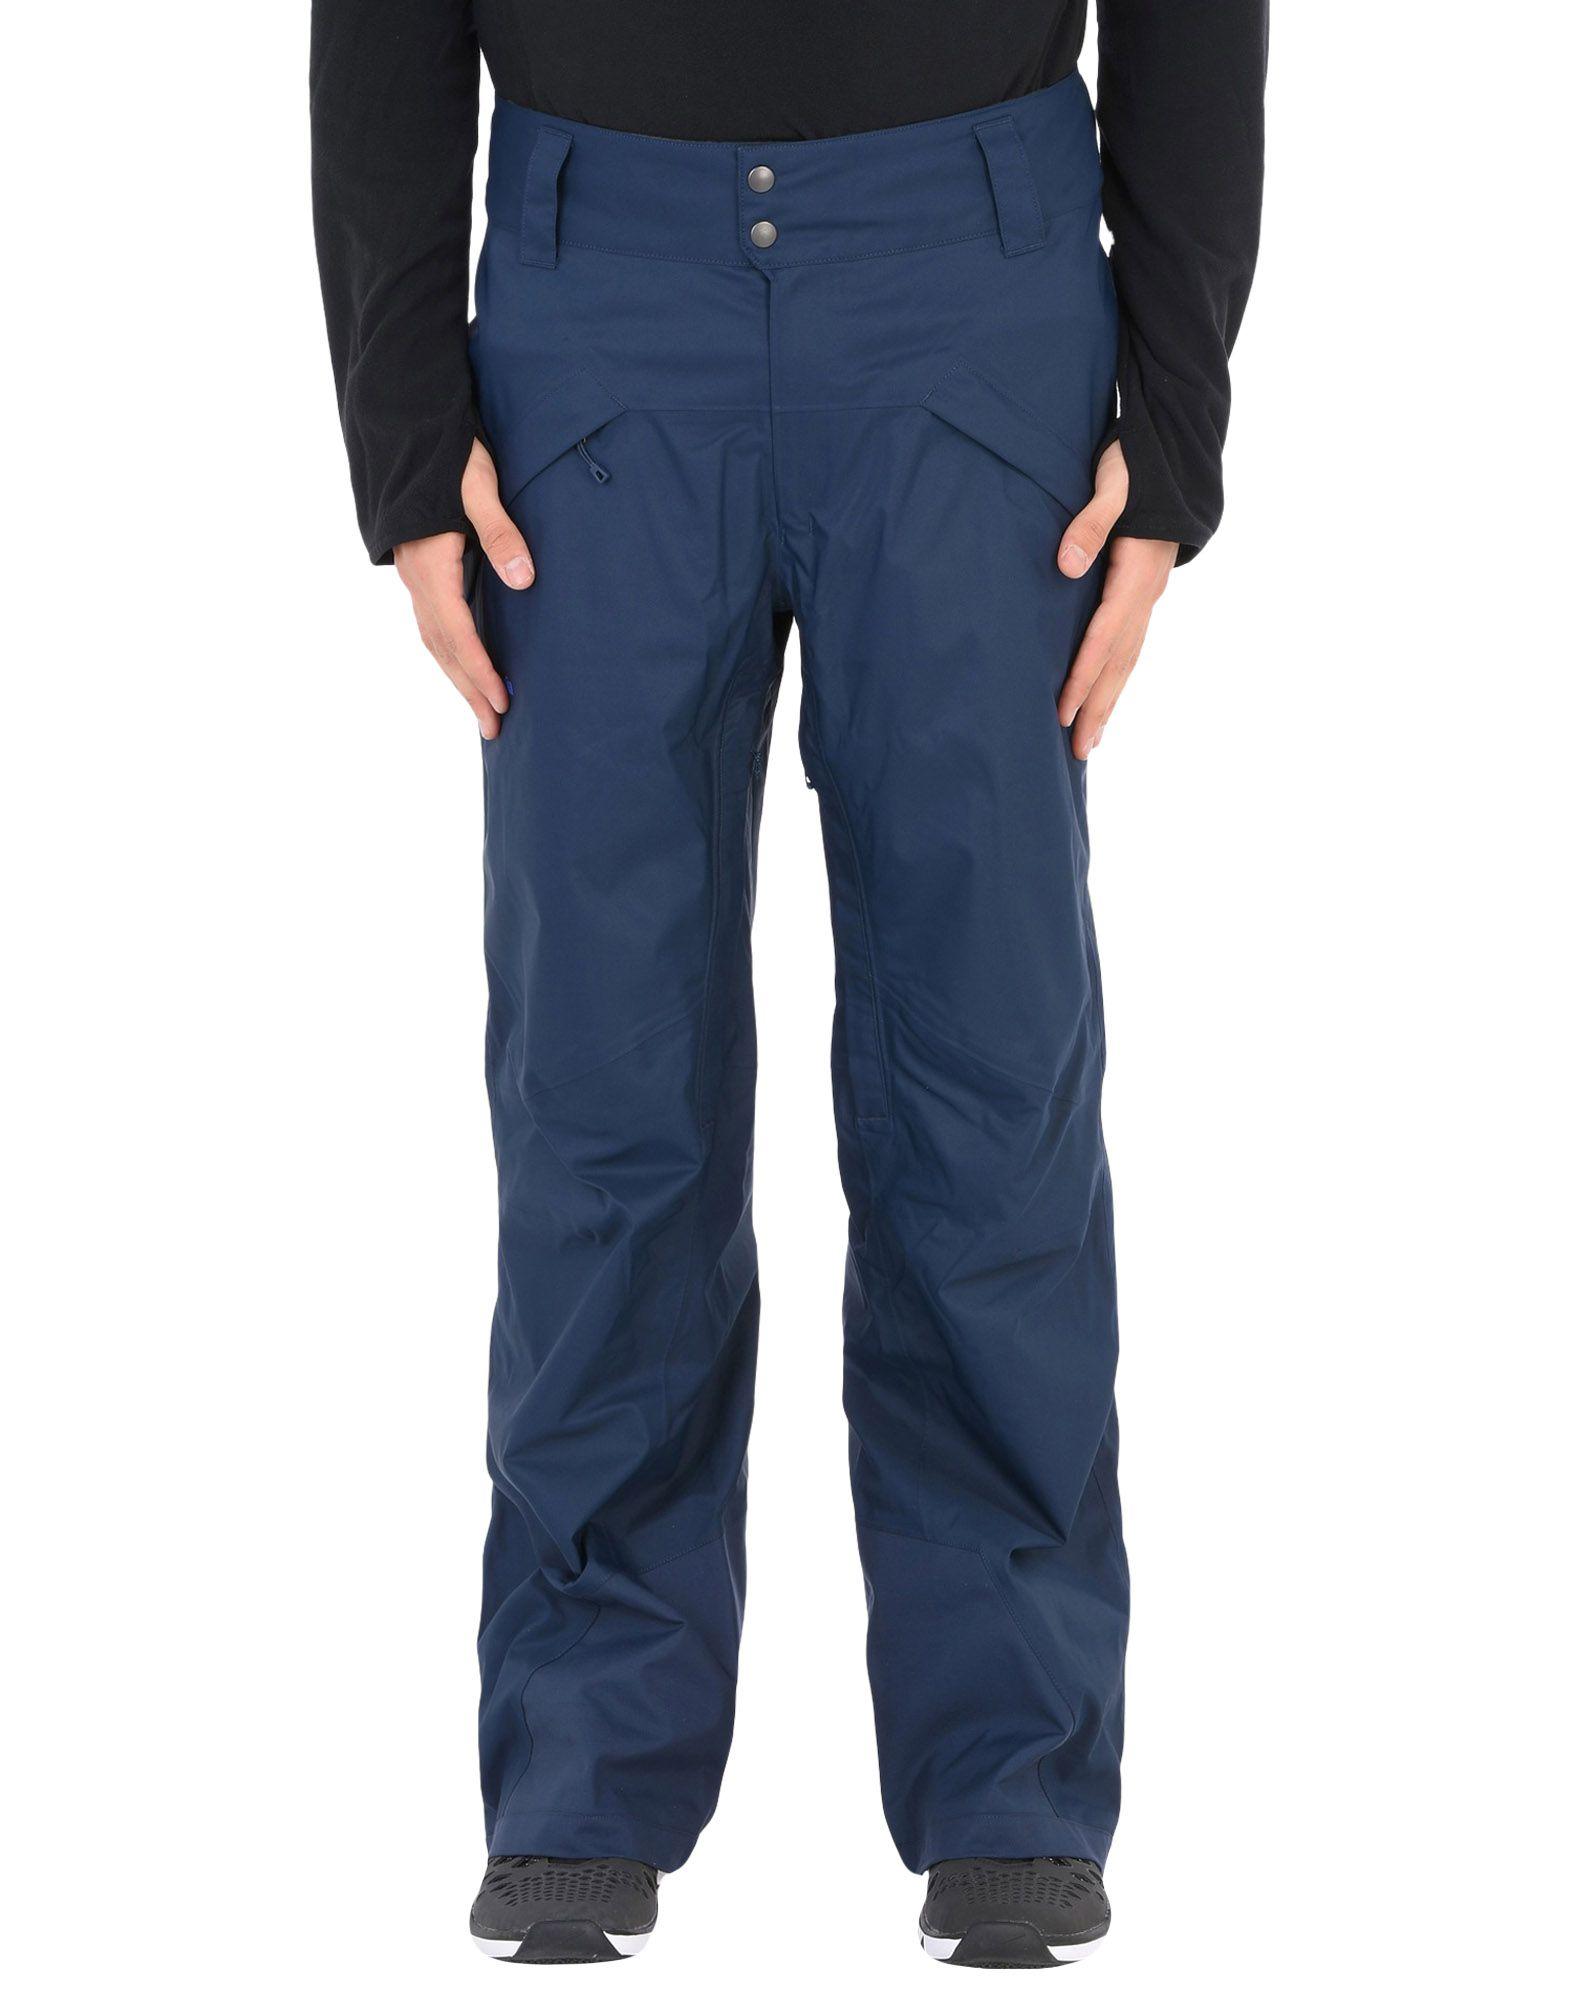 Pantalone Sportivo Patagonia Ms Snowshot Pants - Uomo - Acquista online su